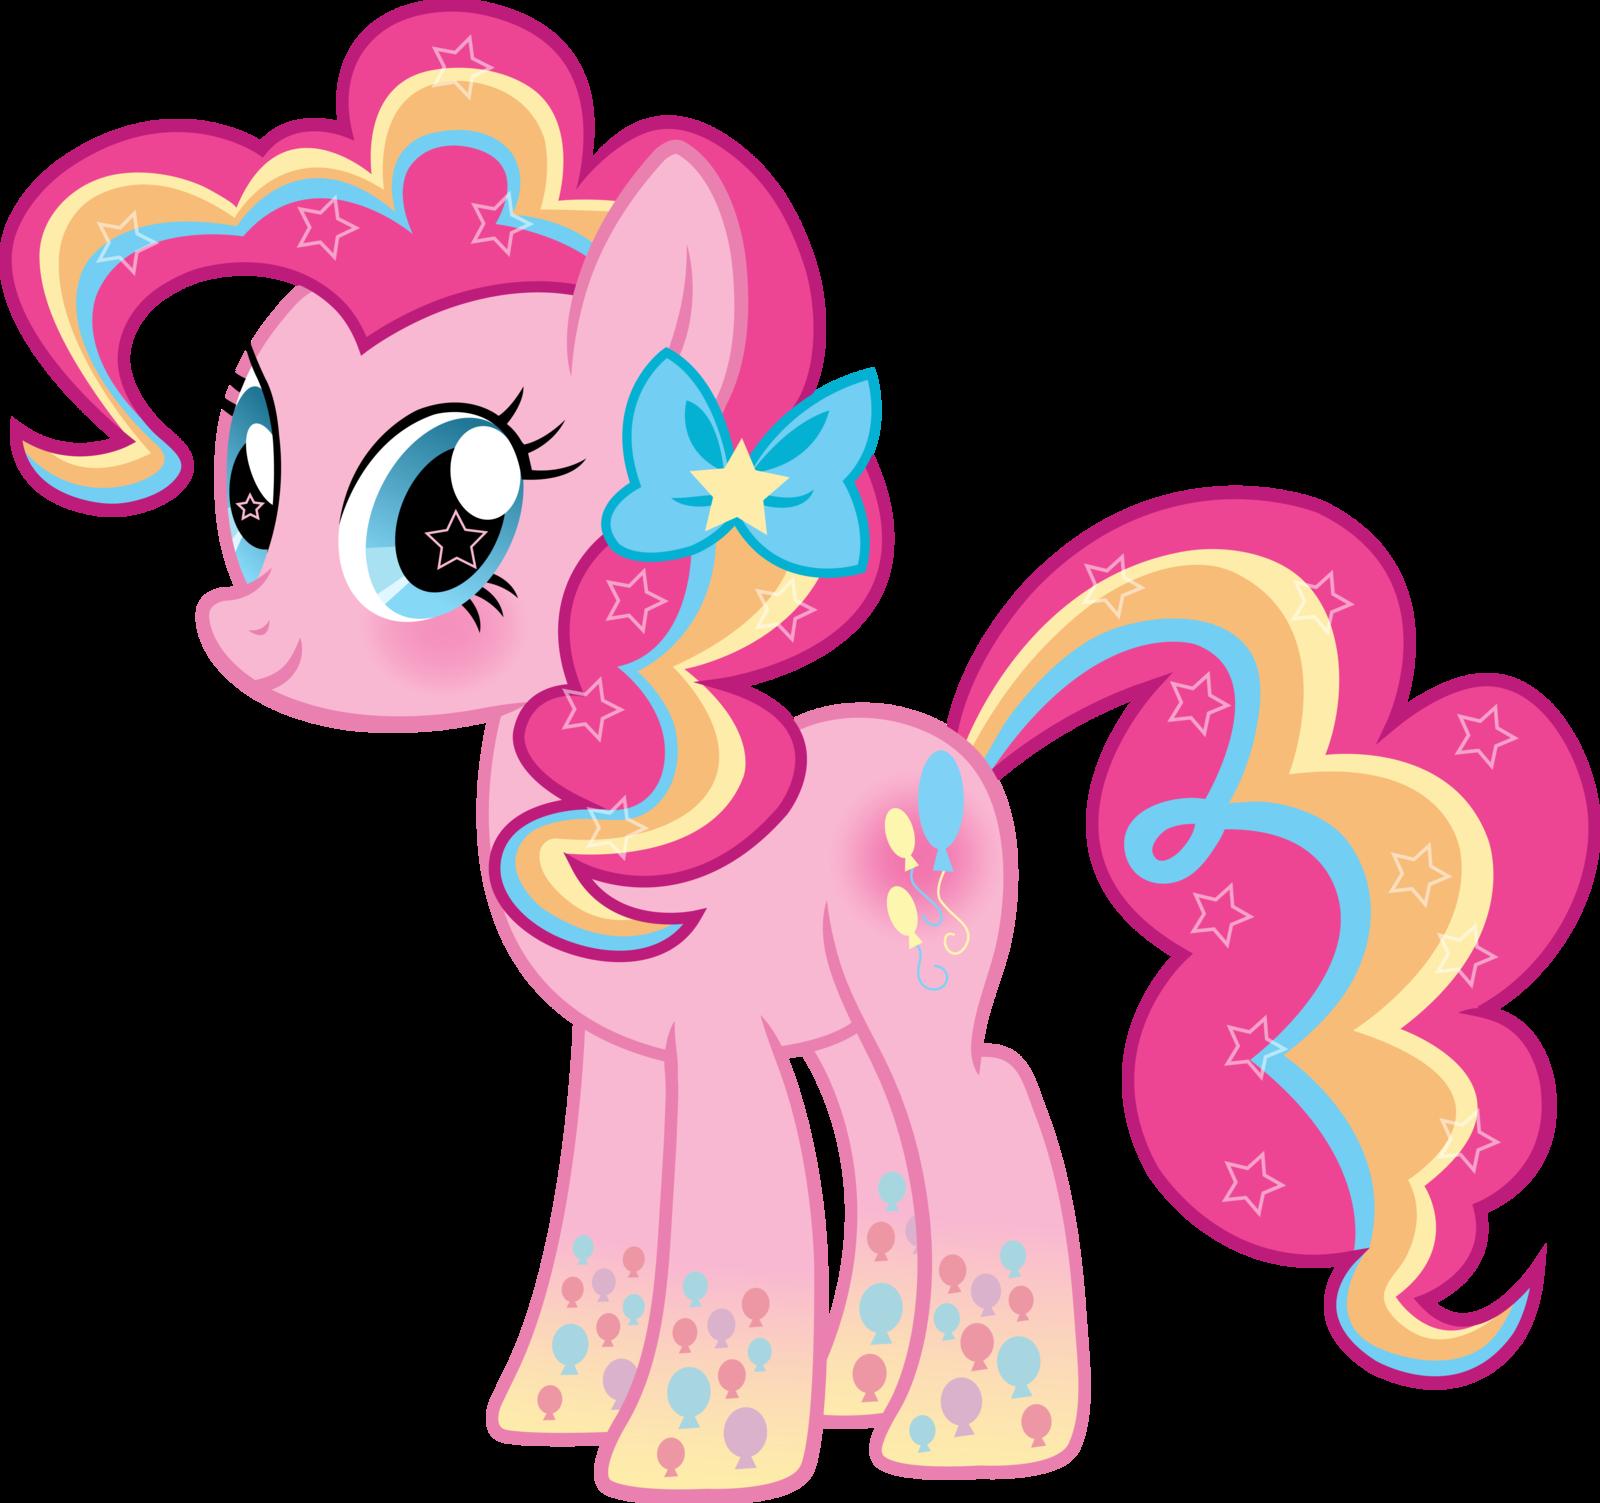 rainbow_power_pinkie_pie_vector_by_icantunloveyoud82upf1